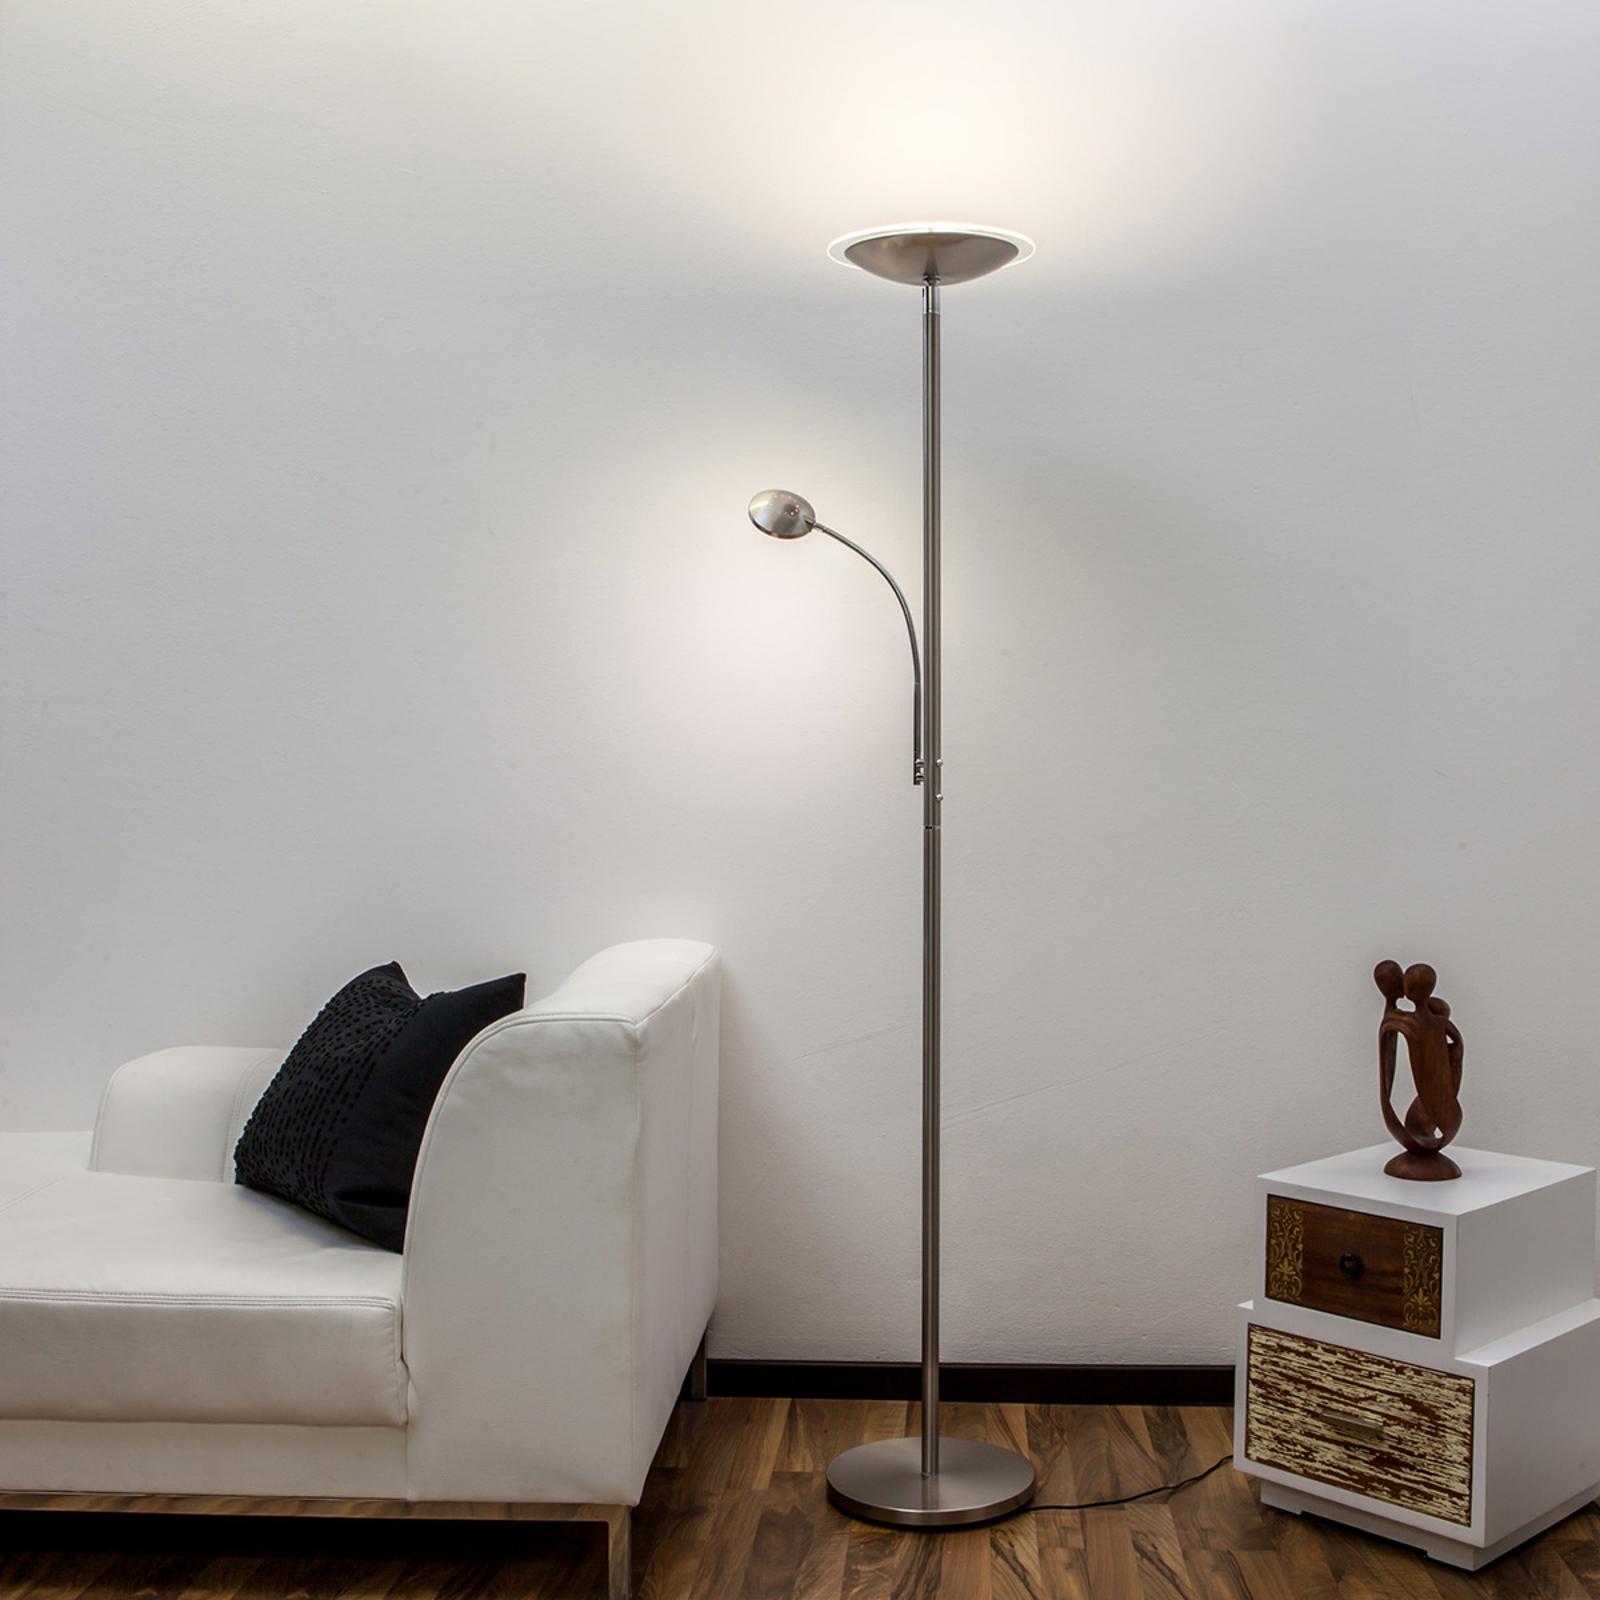 LED-uplight lampe Malea med læsearm, nikkel